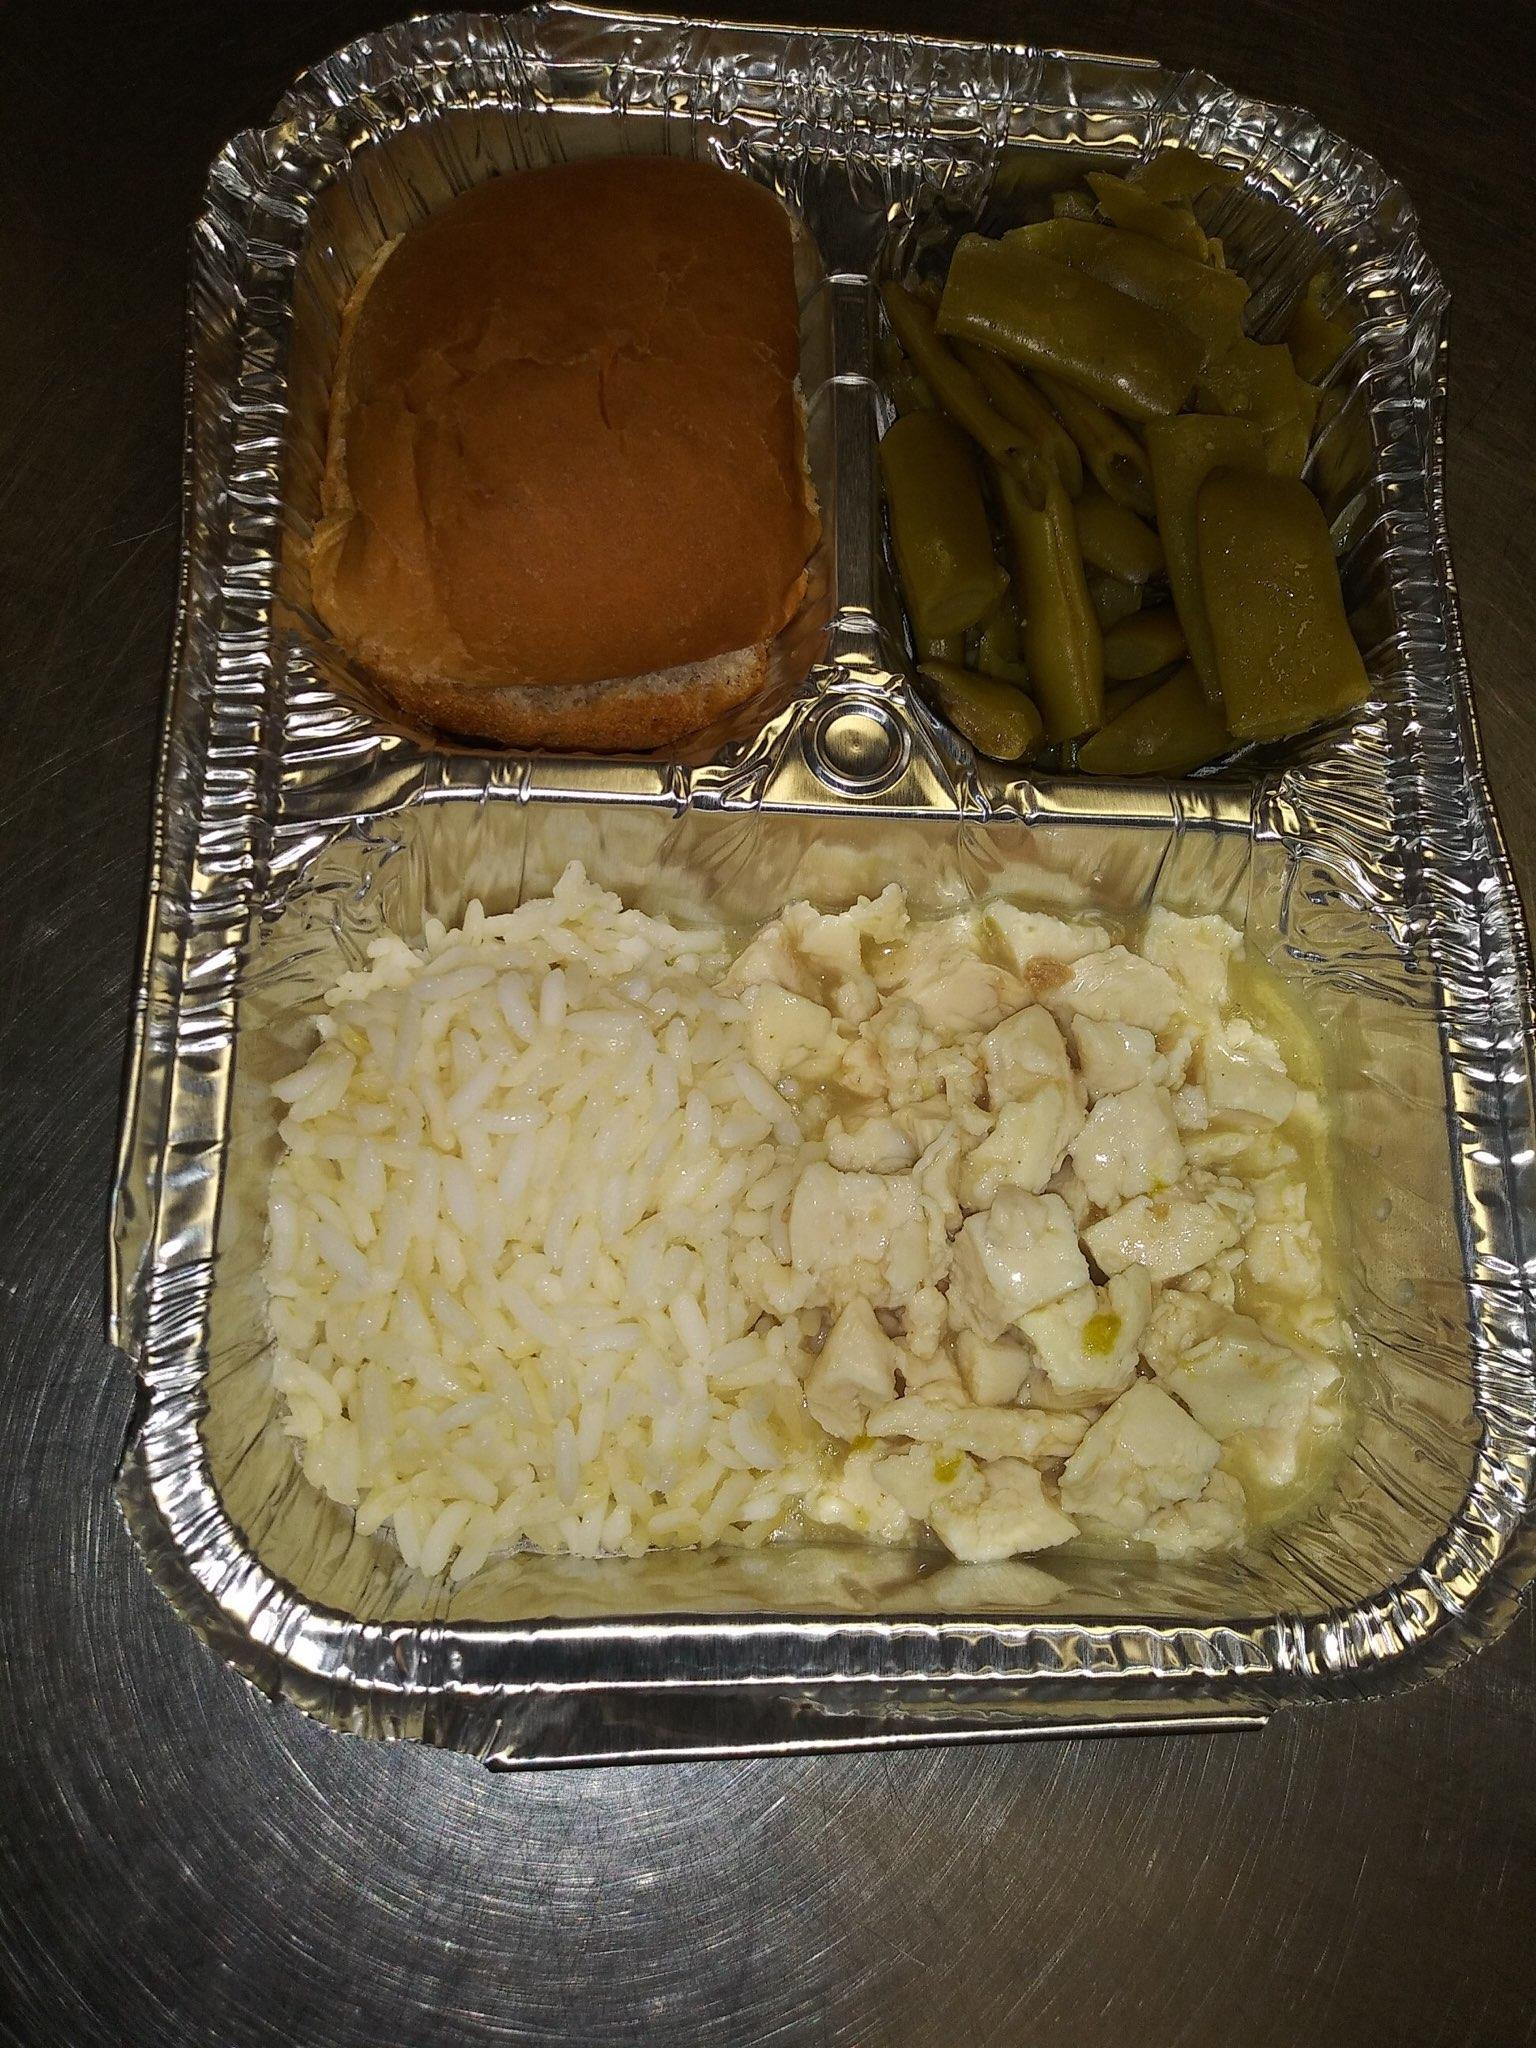 Virtual meal tray 3